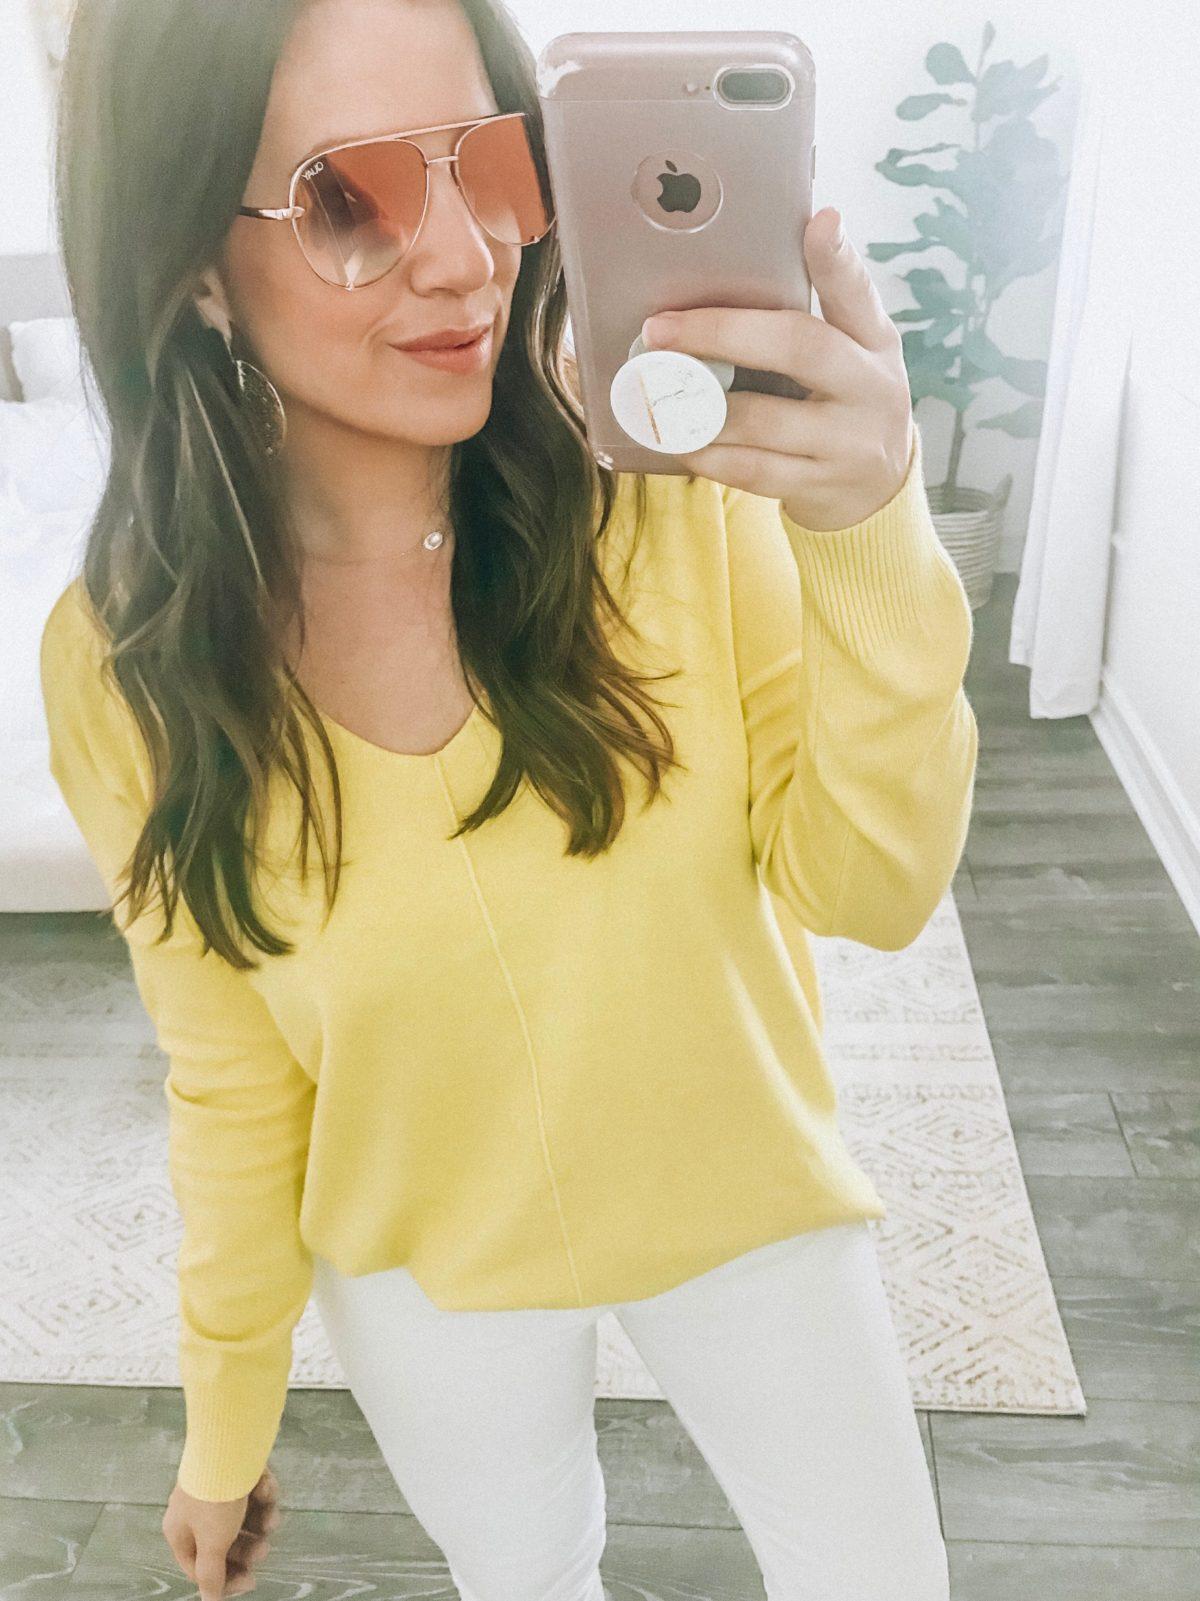 High Key Mini Double Rose Quay Sunglasses, Florida Fashion and Lifestyle Blogger Jaime Cittadino